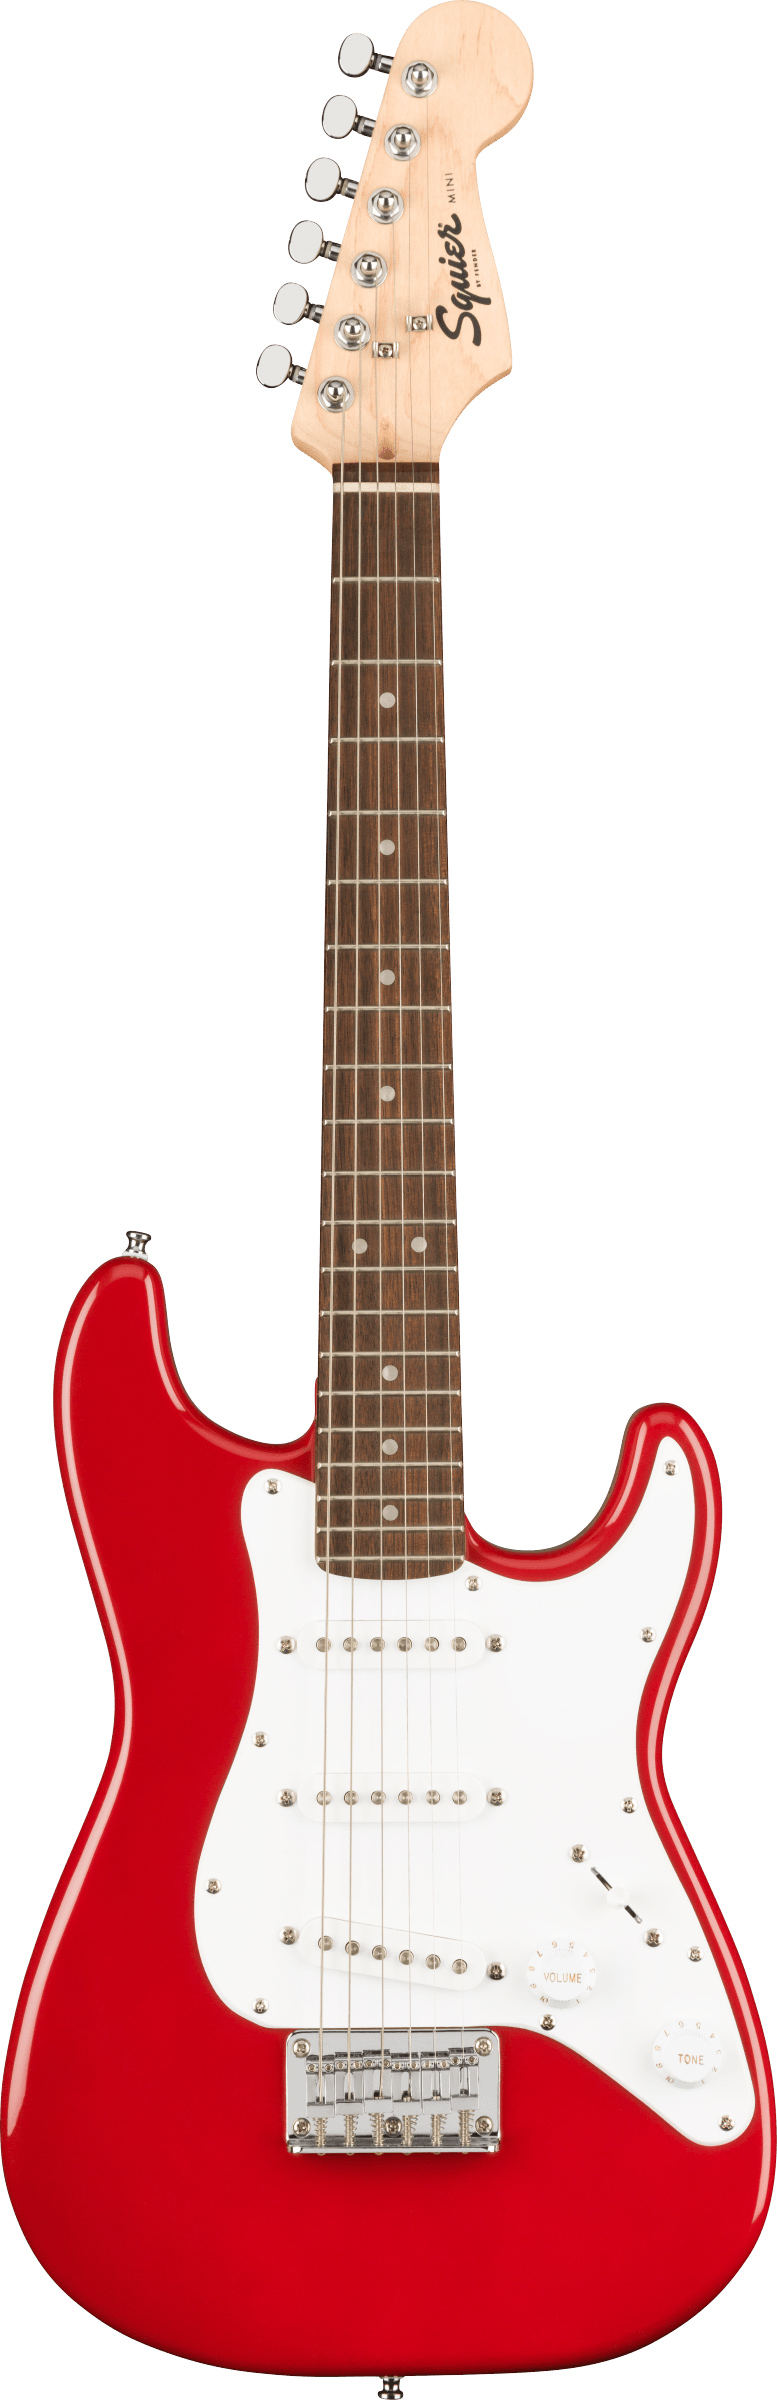 thumbnail 2 - Fender Squier 3/4-Size Mini Stratocaster - Dakota Red w/ Amplifier